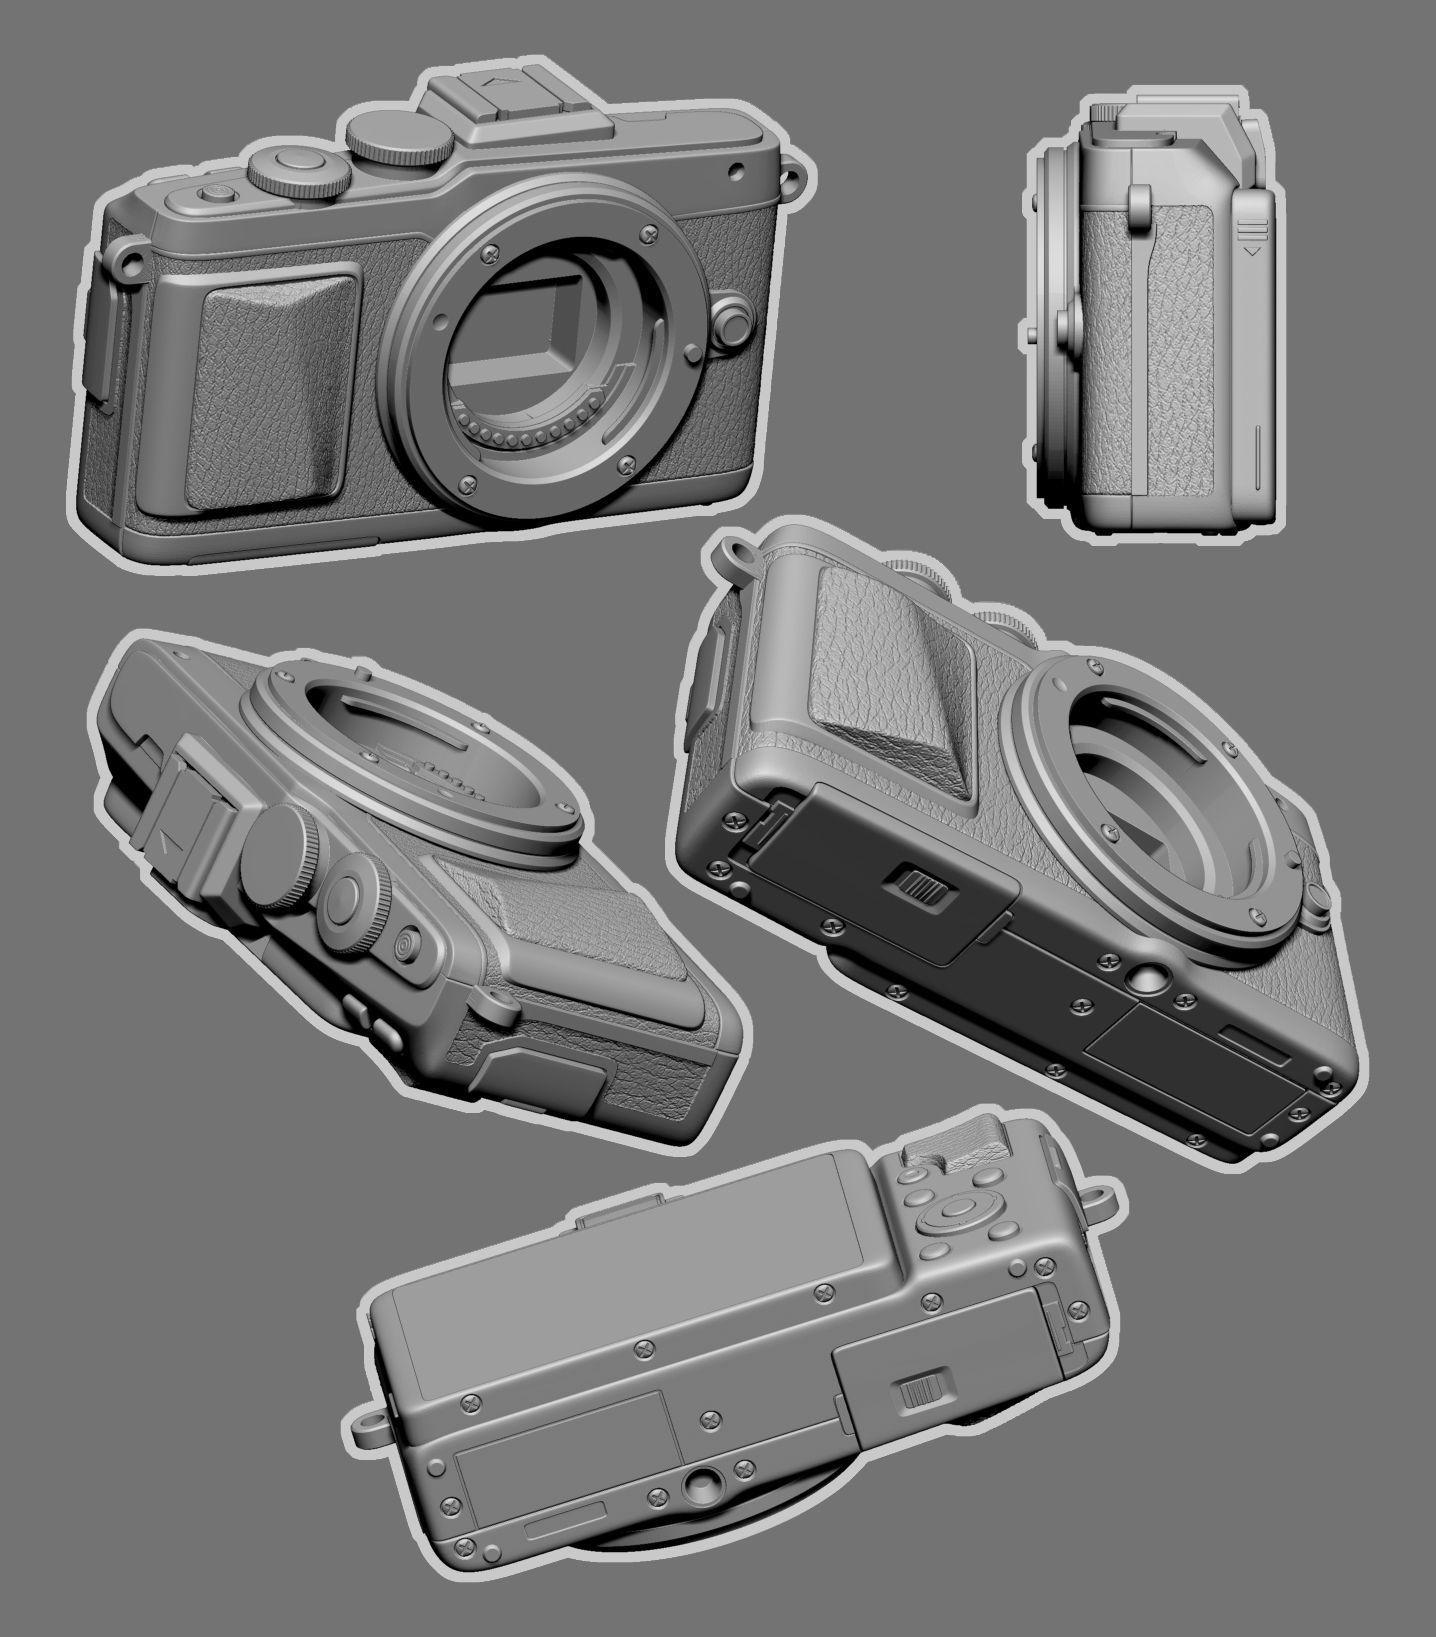 Camera Model-Olympus PEN E-PL7